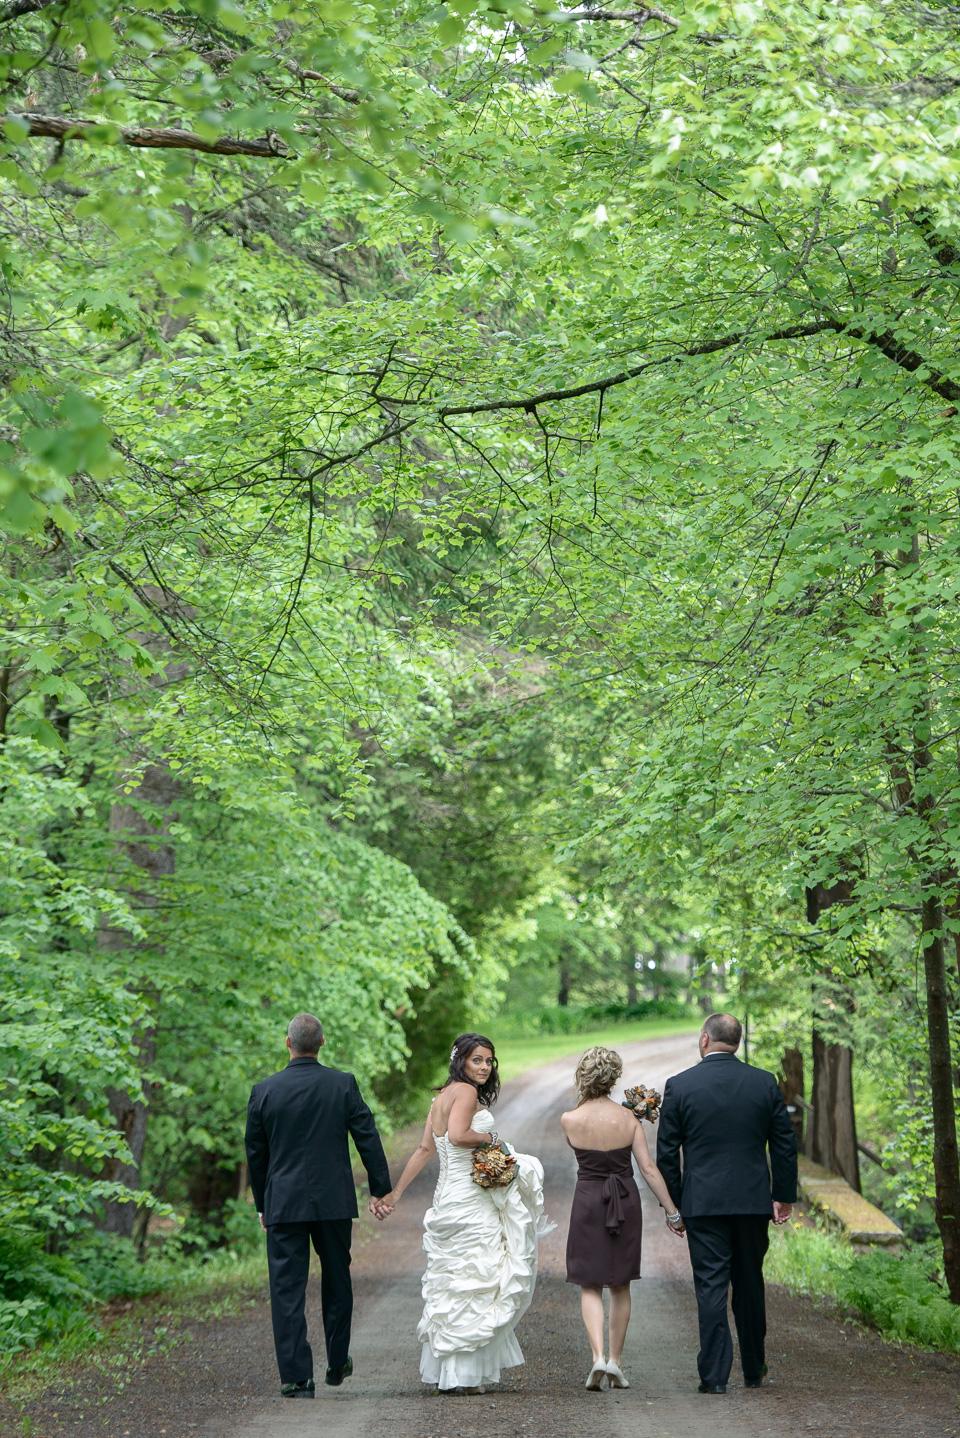 NIgel Fearon Photography | The LeBlanc Wedding-70.jpg